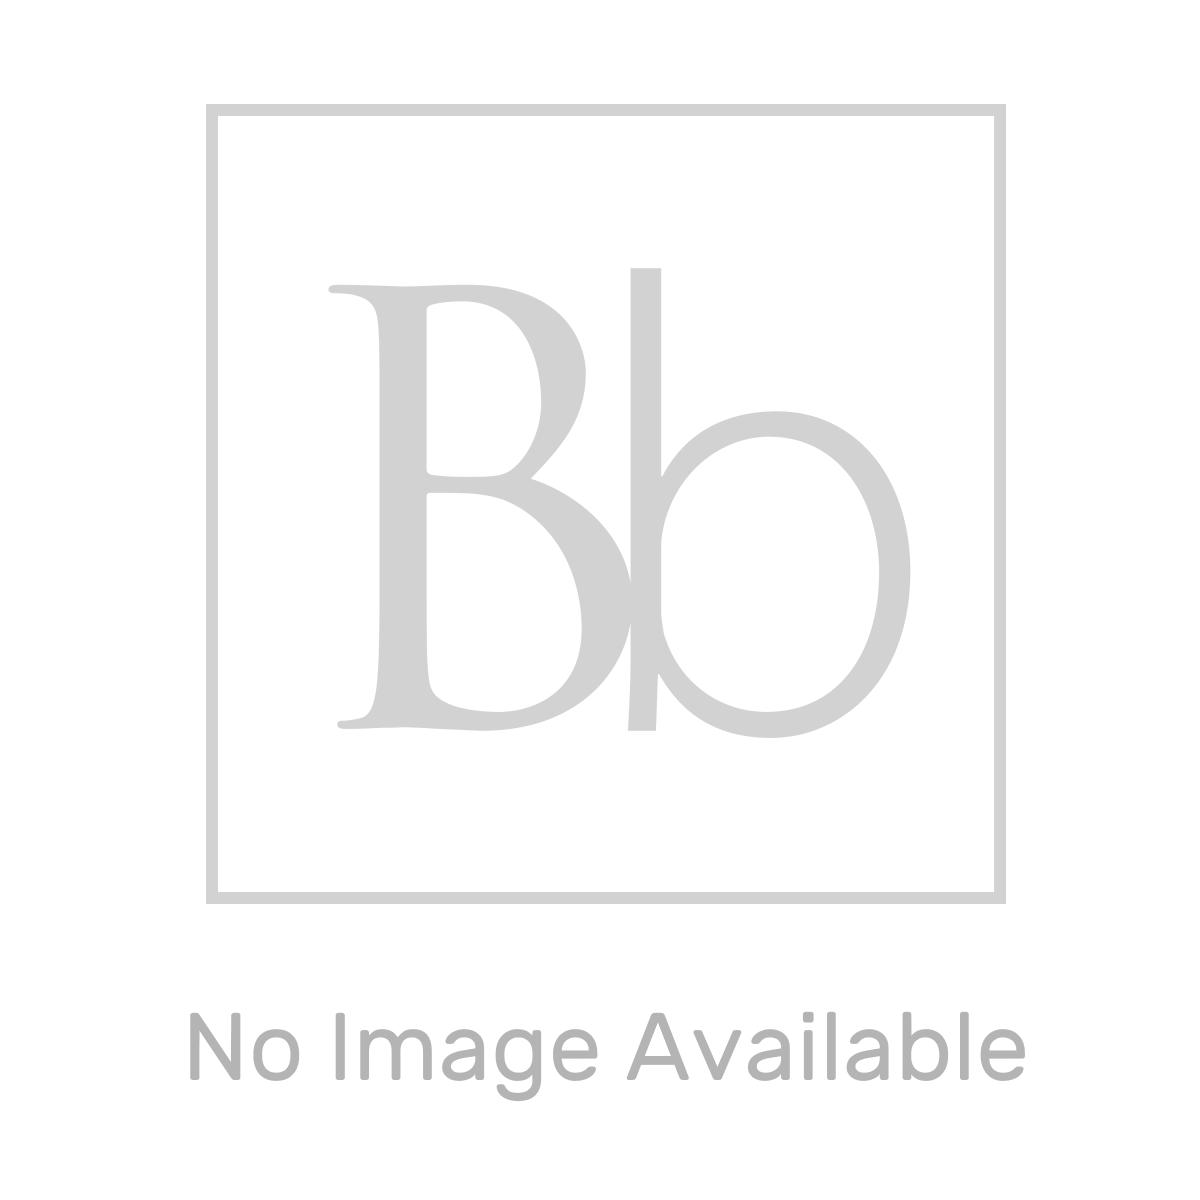 RAK Series 600 Back To Wall Toilet and 400 Series Gloss White Vanity Unit Door